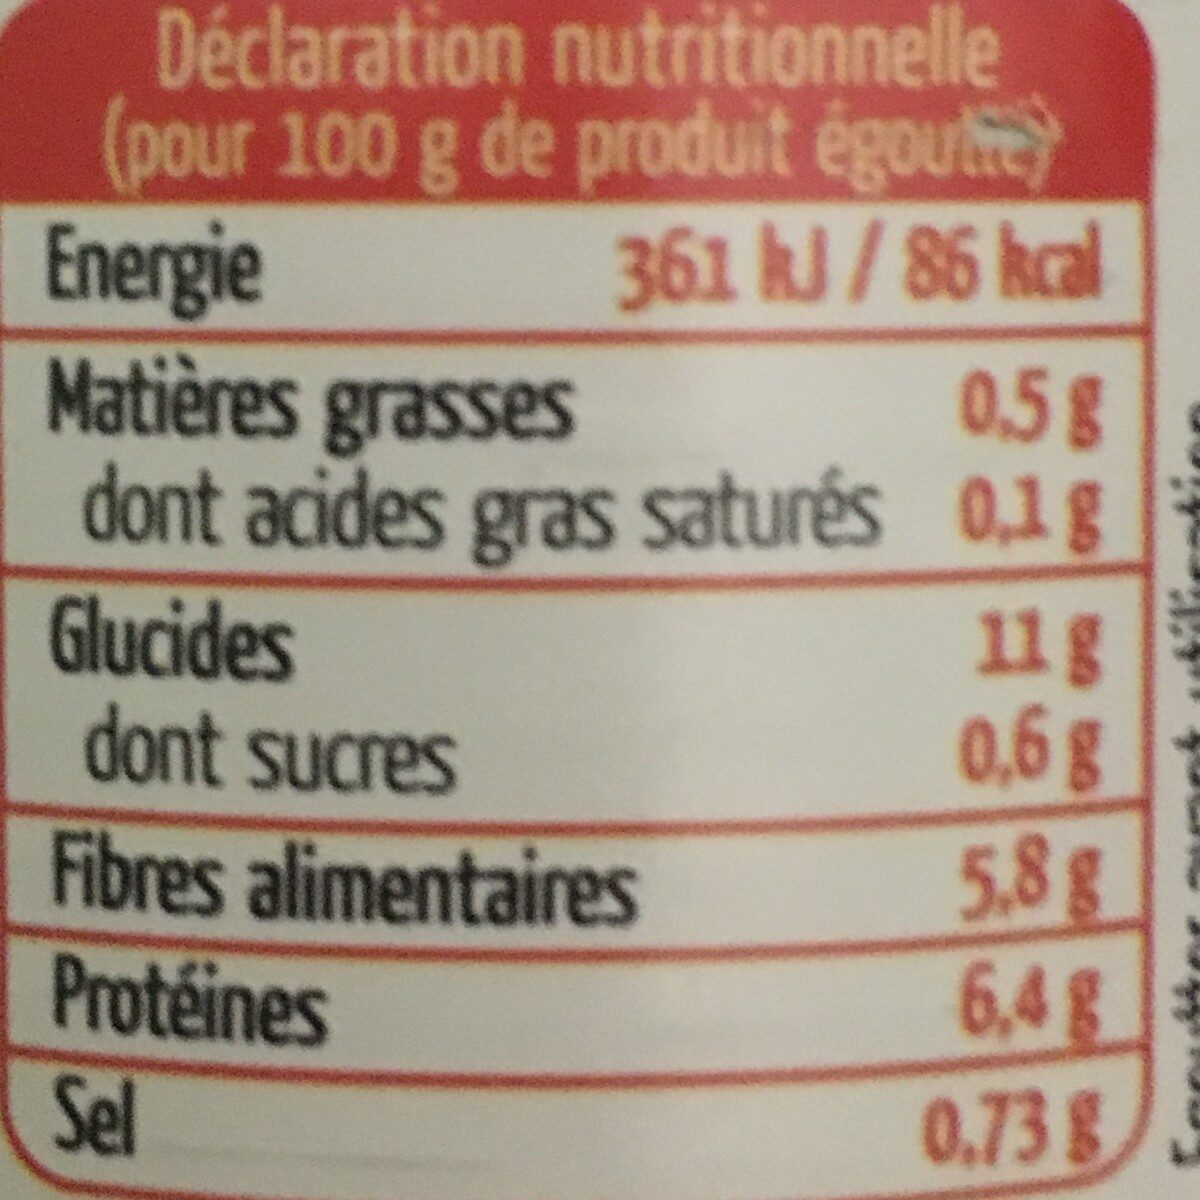 Haricots blancs - Voedingswaarden - fr